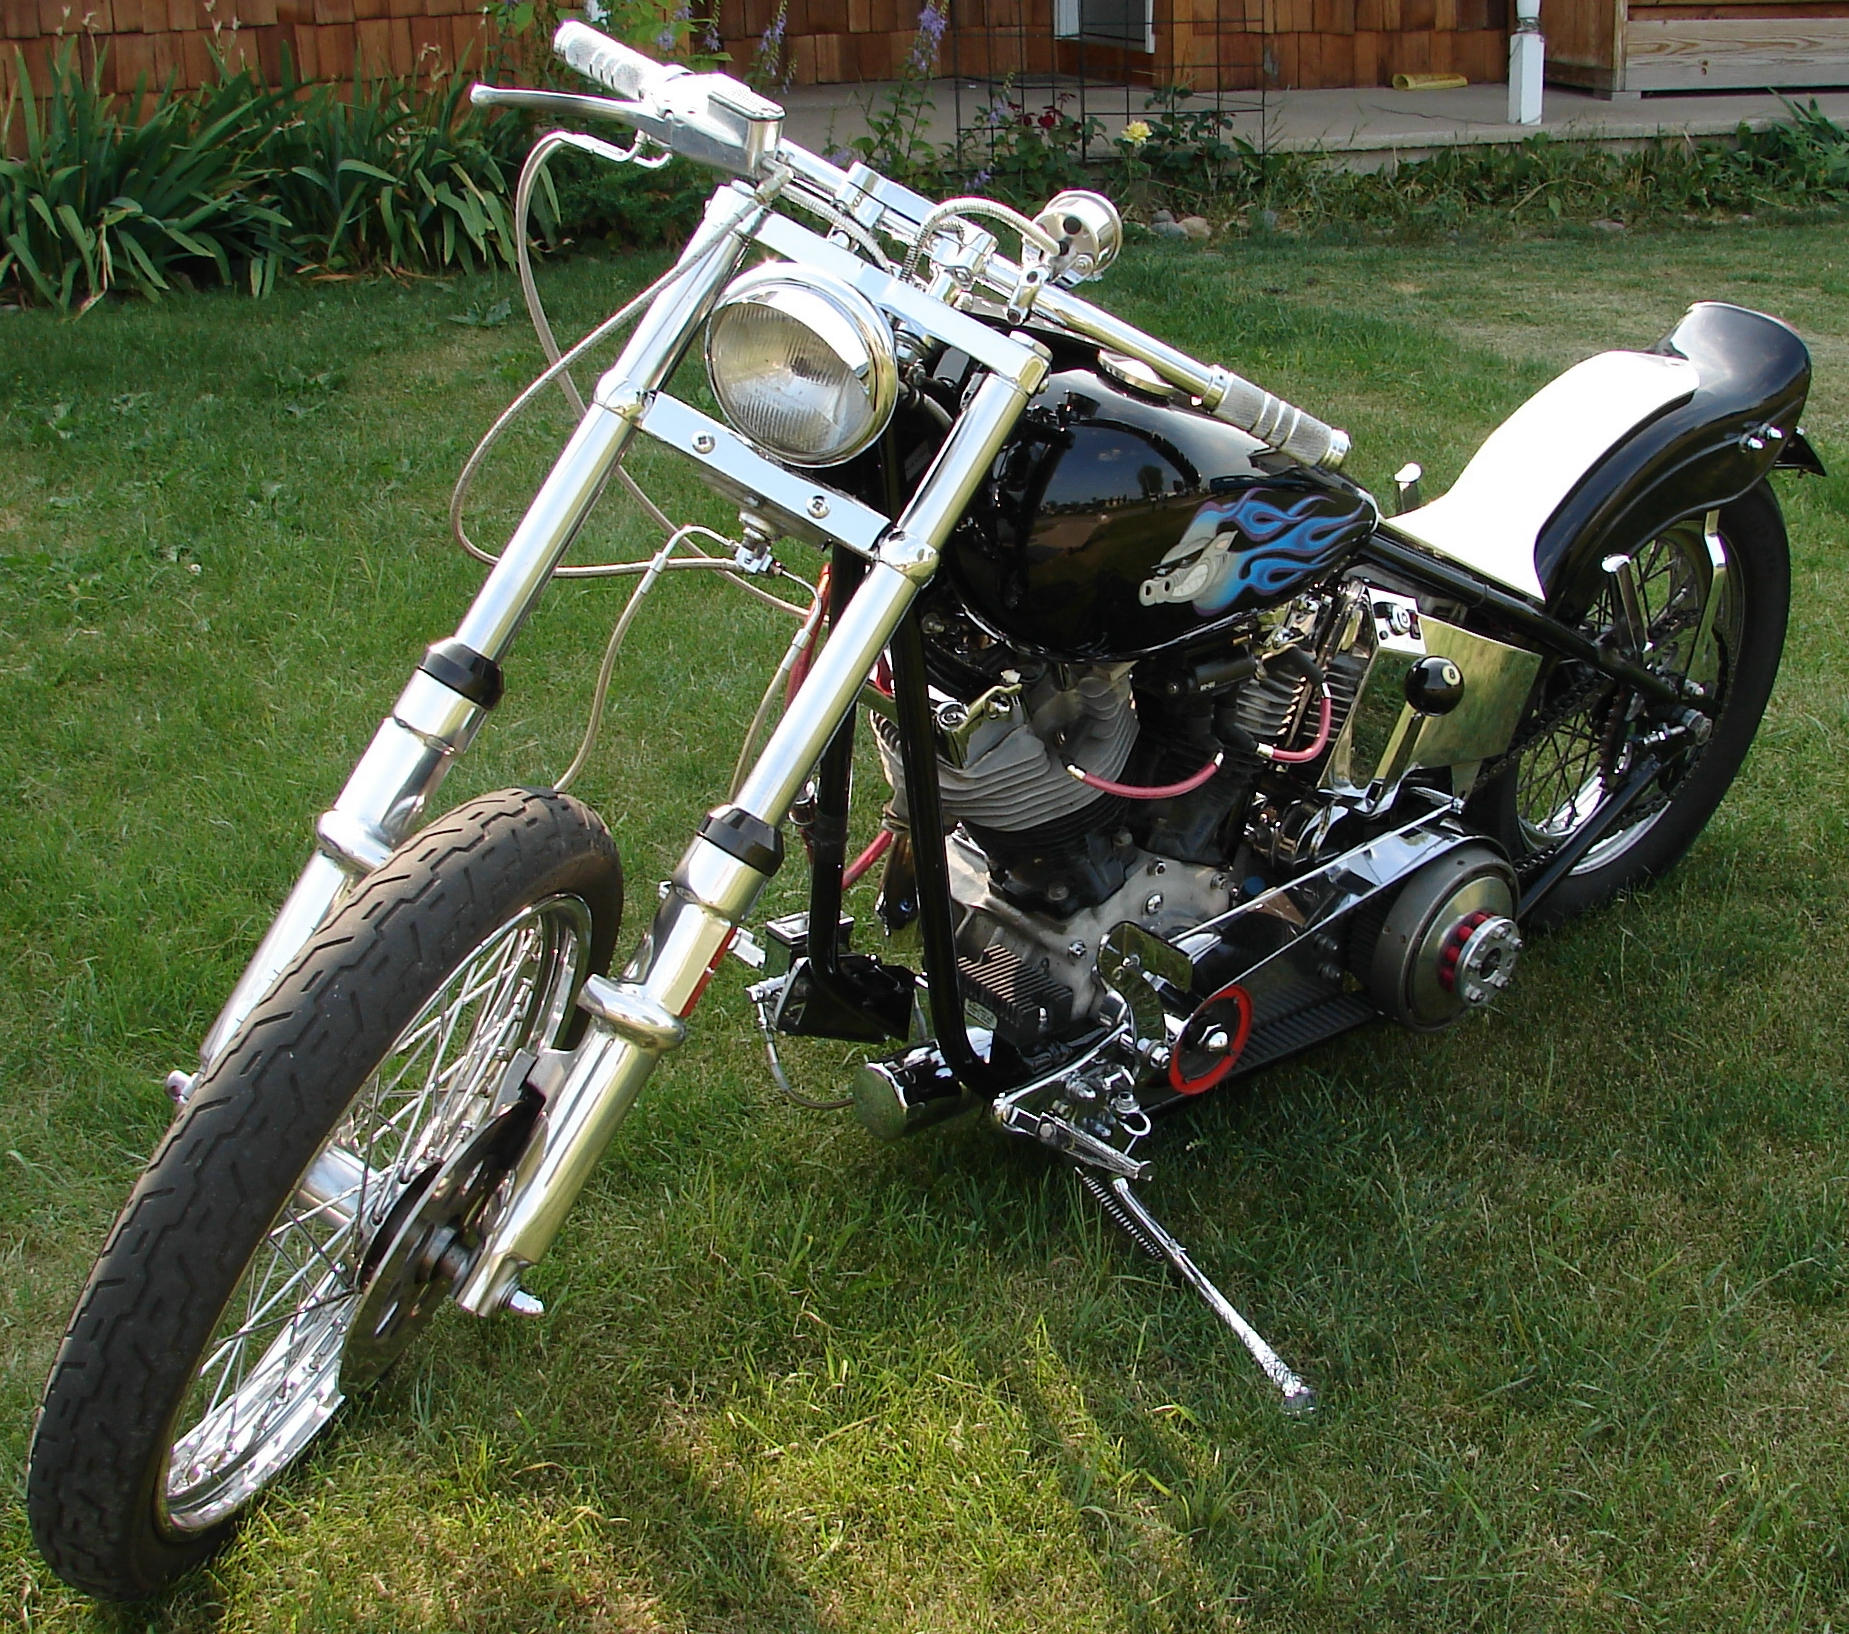 Hog Harley-Davidson Motorcycle by FantasyStock